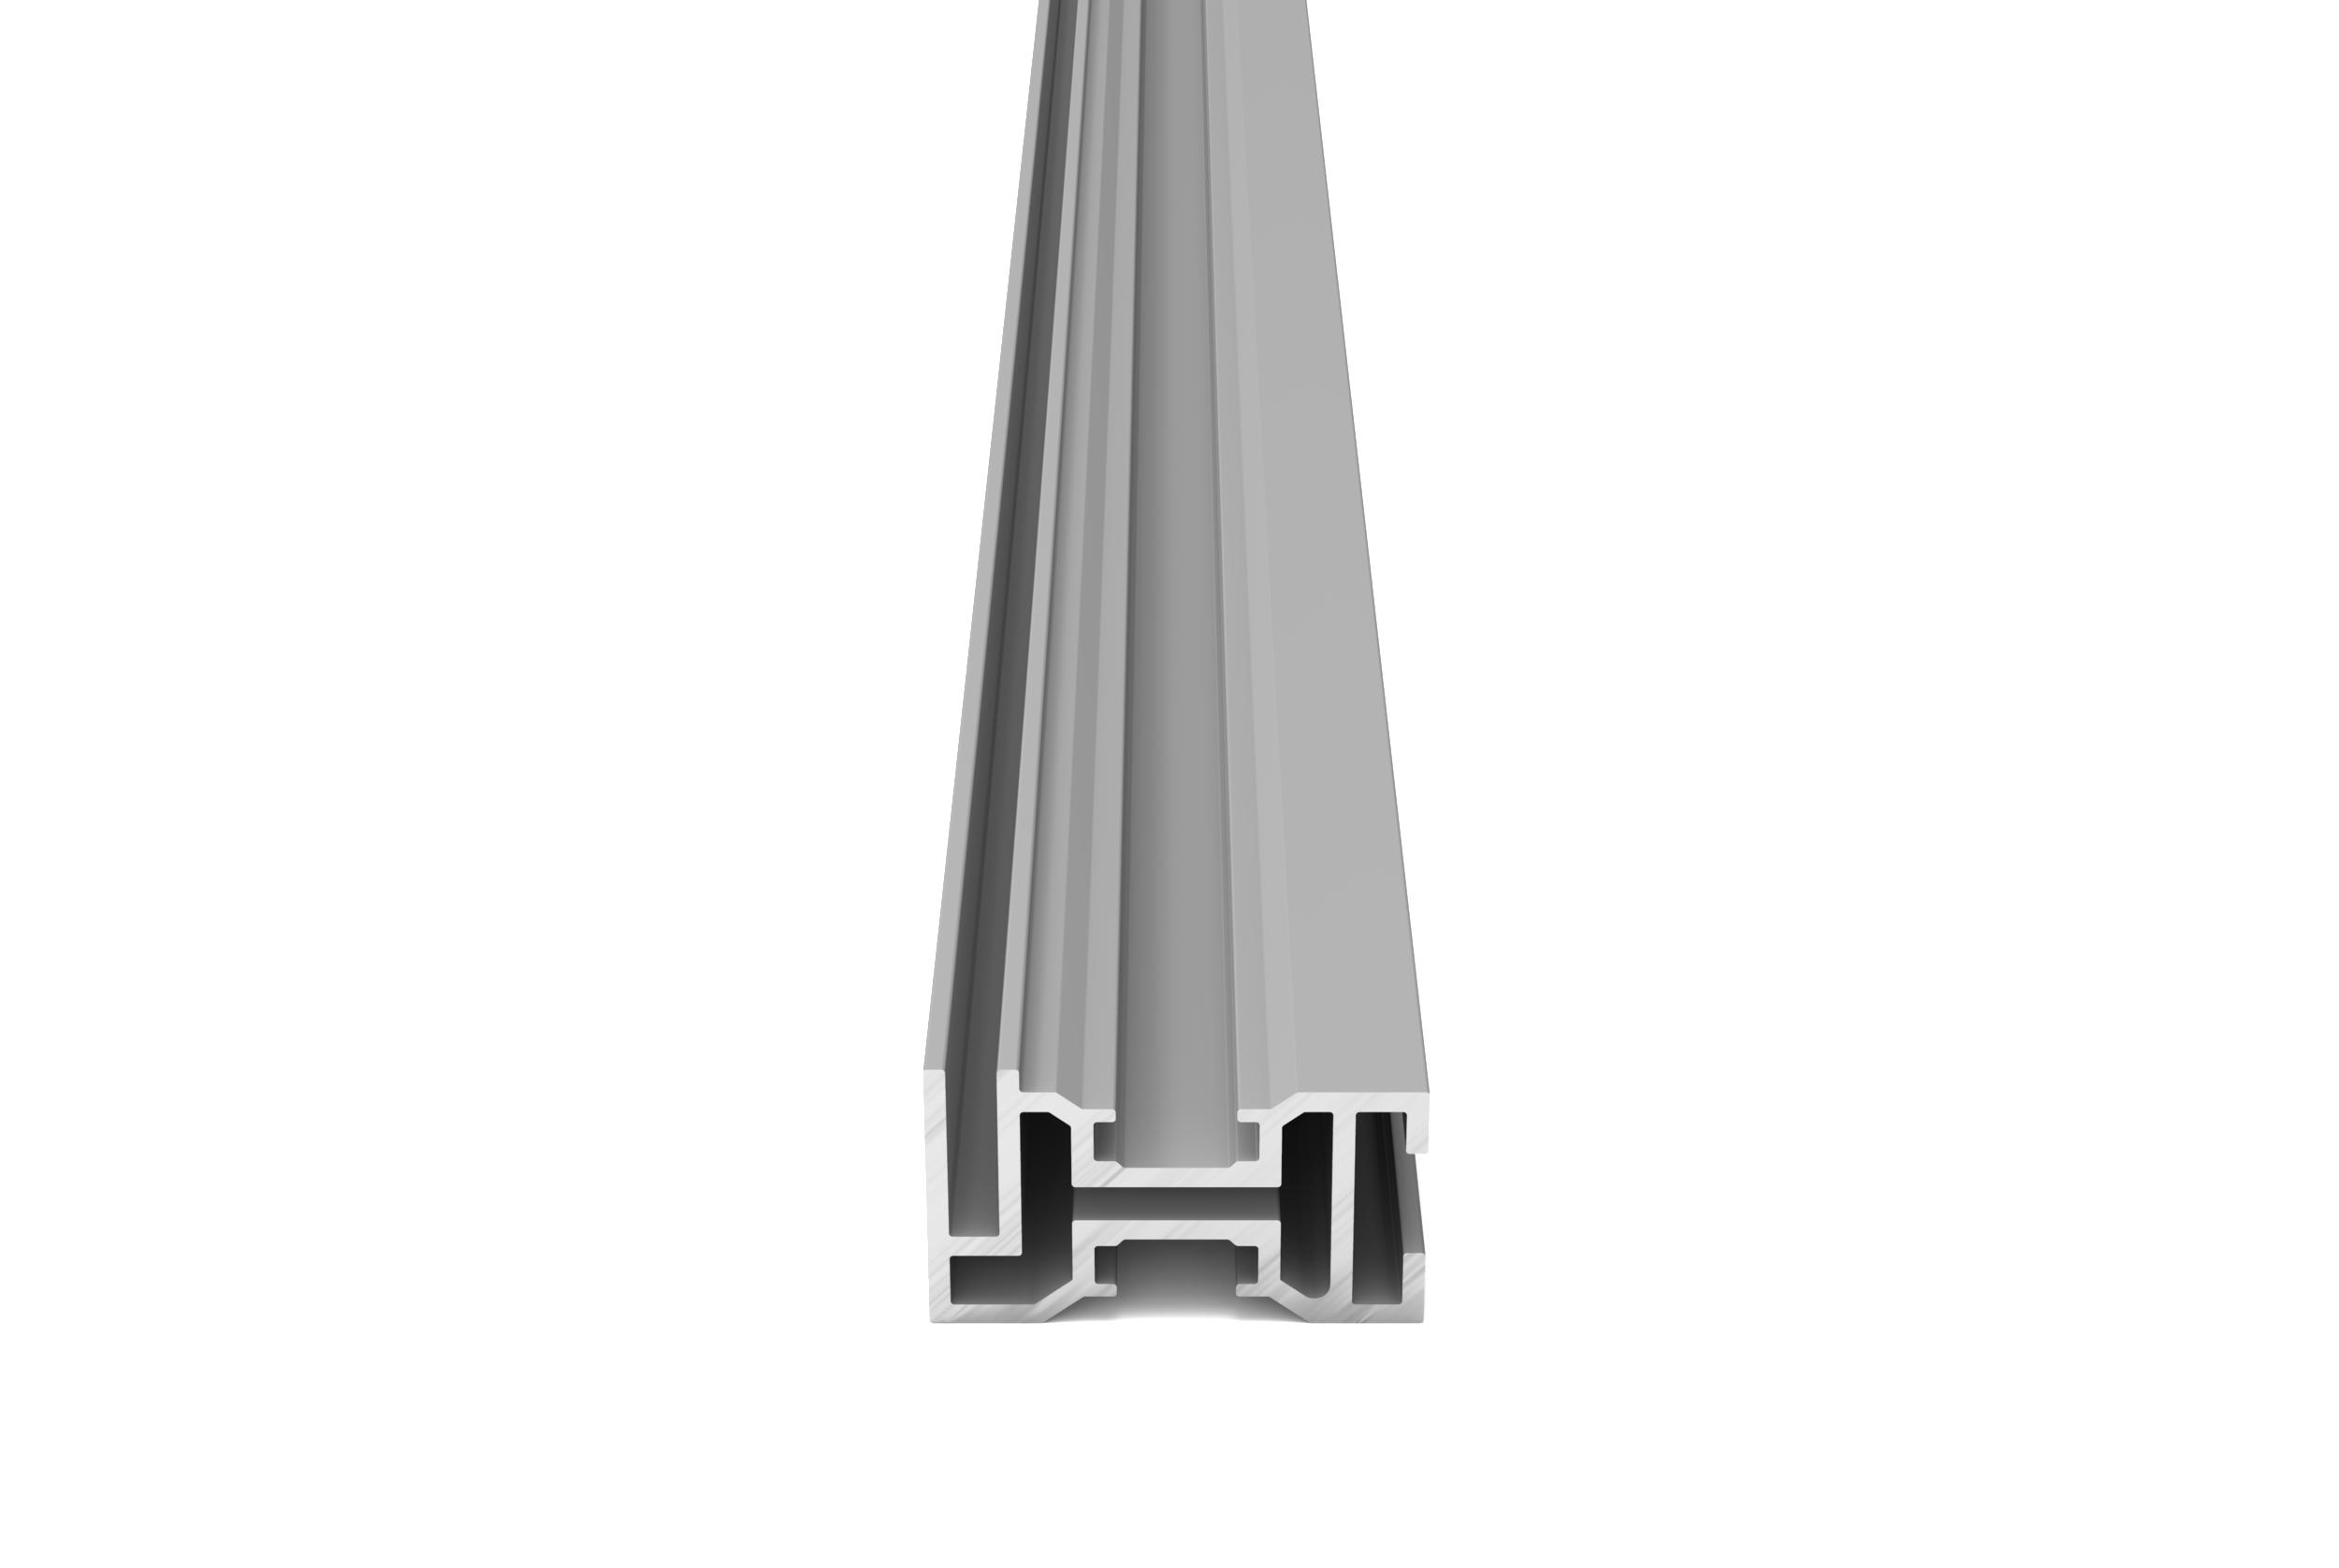 Profile 22 - Single SidedVisible edge 23mm#FR-22